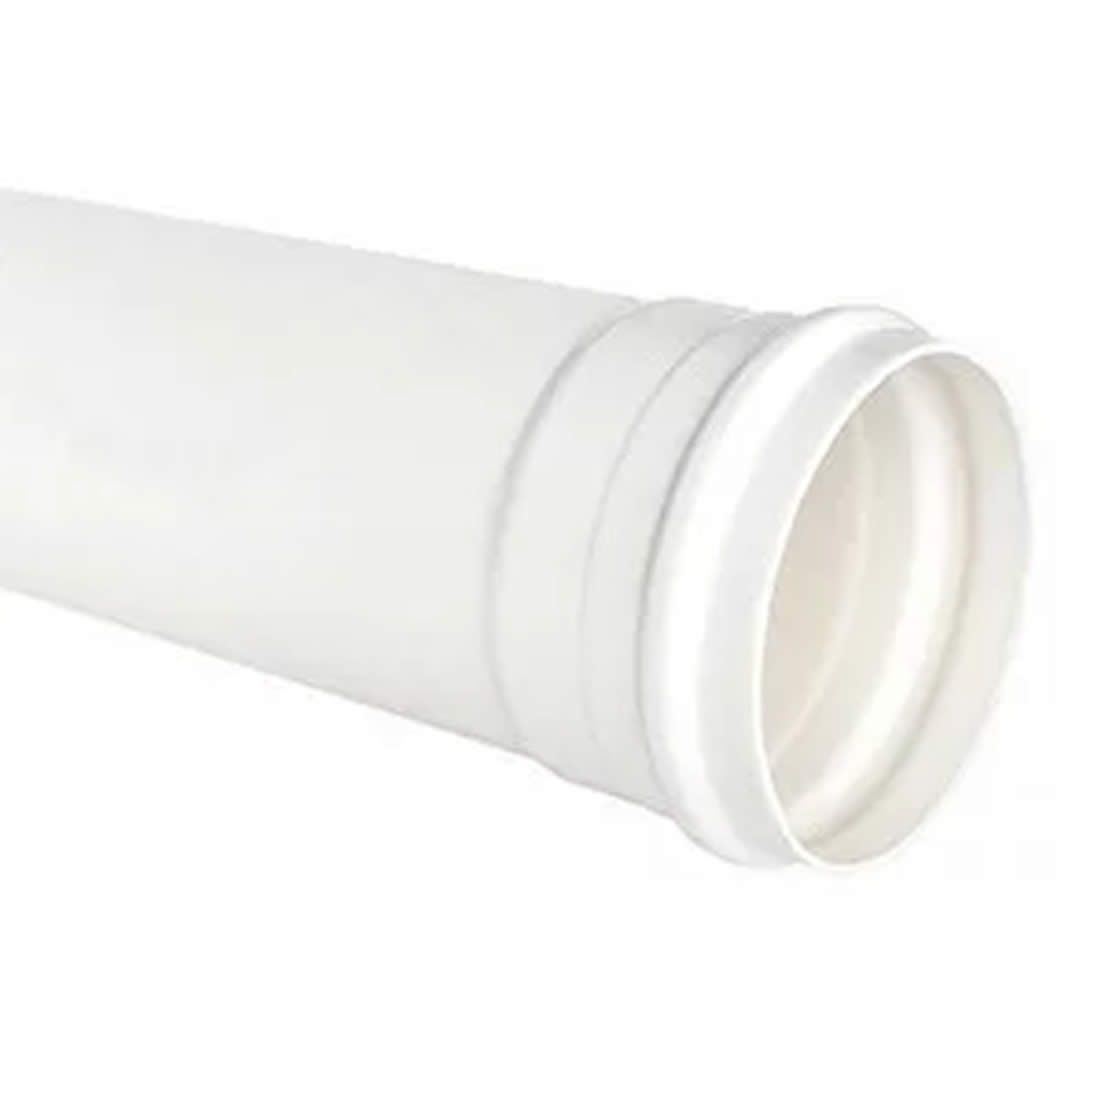 Tubo PVC Para Esgoto 300mm X 6 Metros Tigre